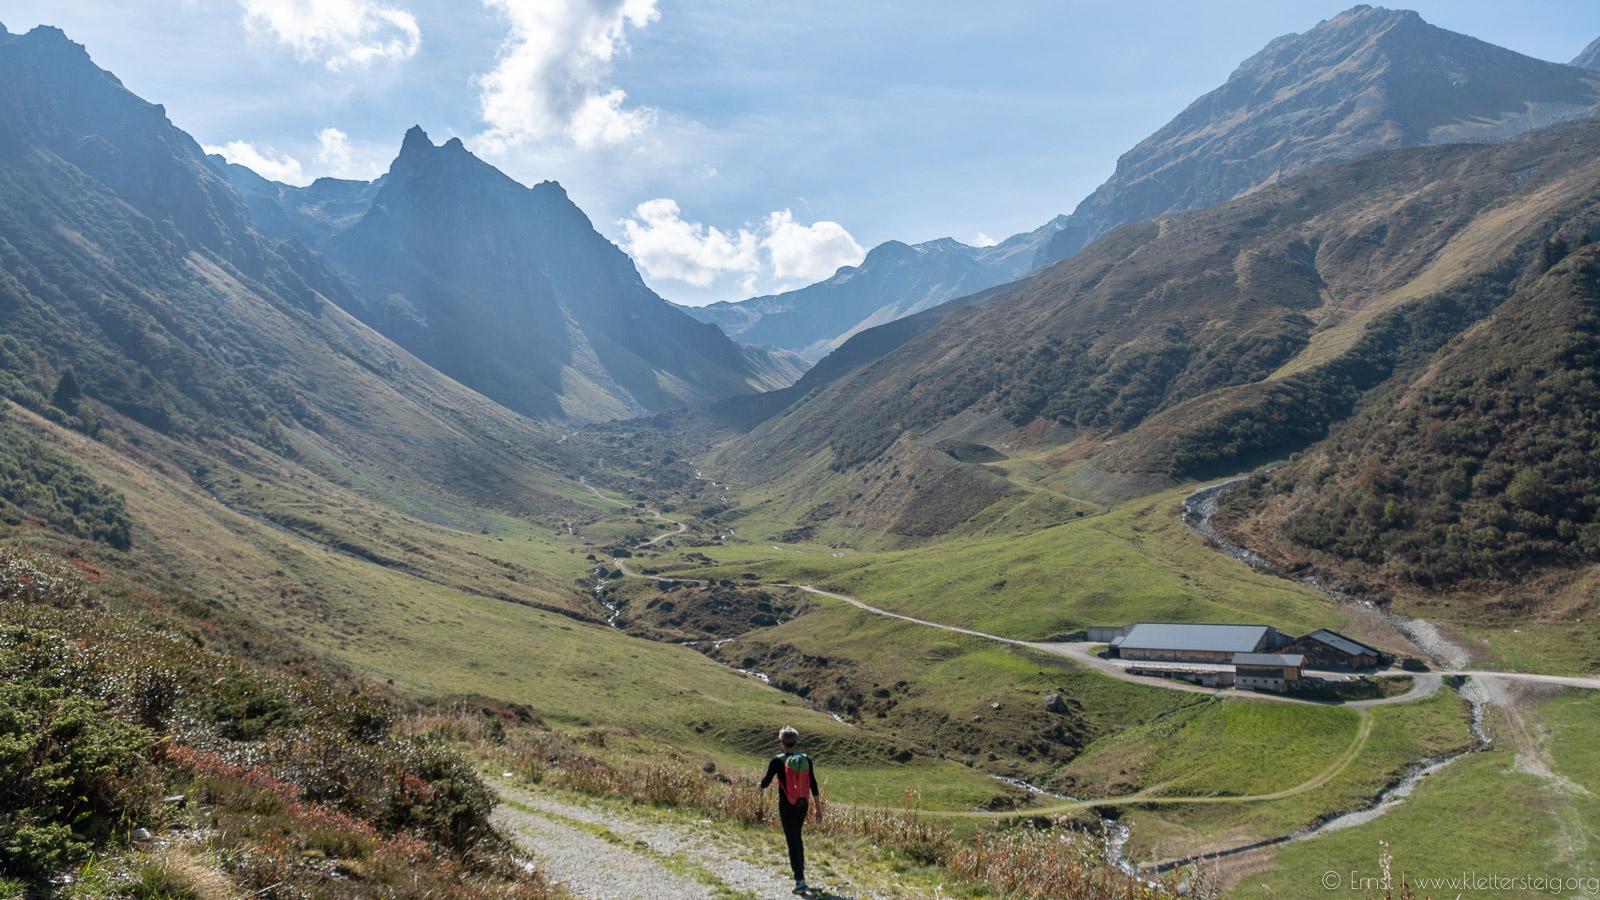 Klettersteig Madrisella : Madrisella klettersteig klettersteige